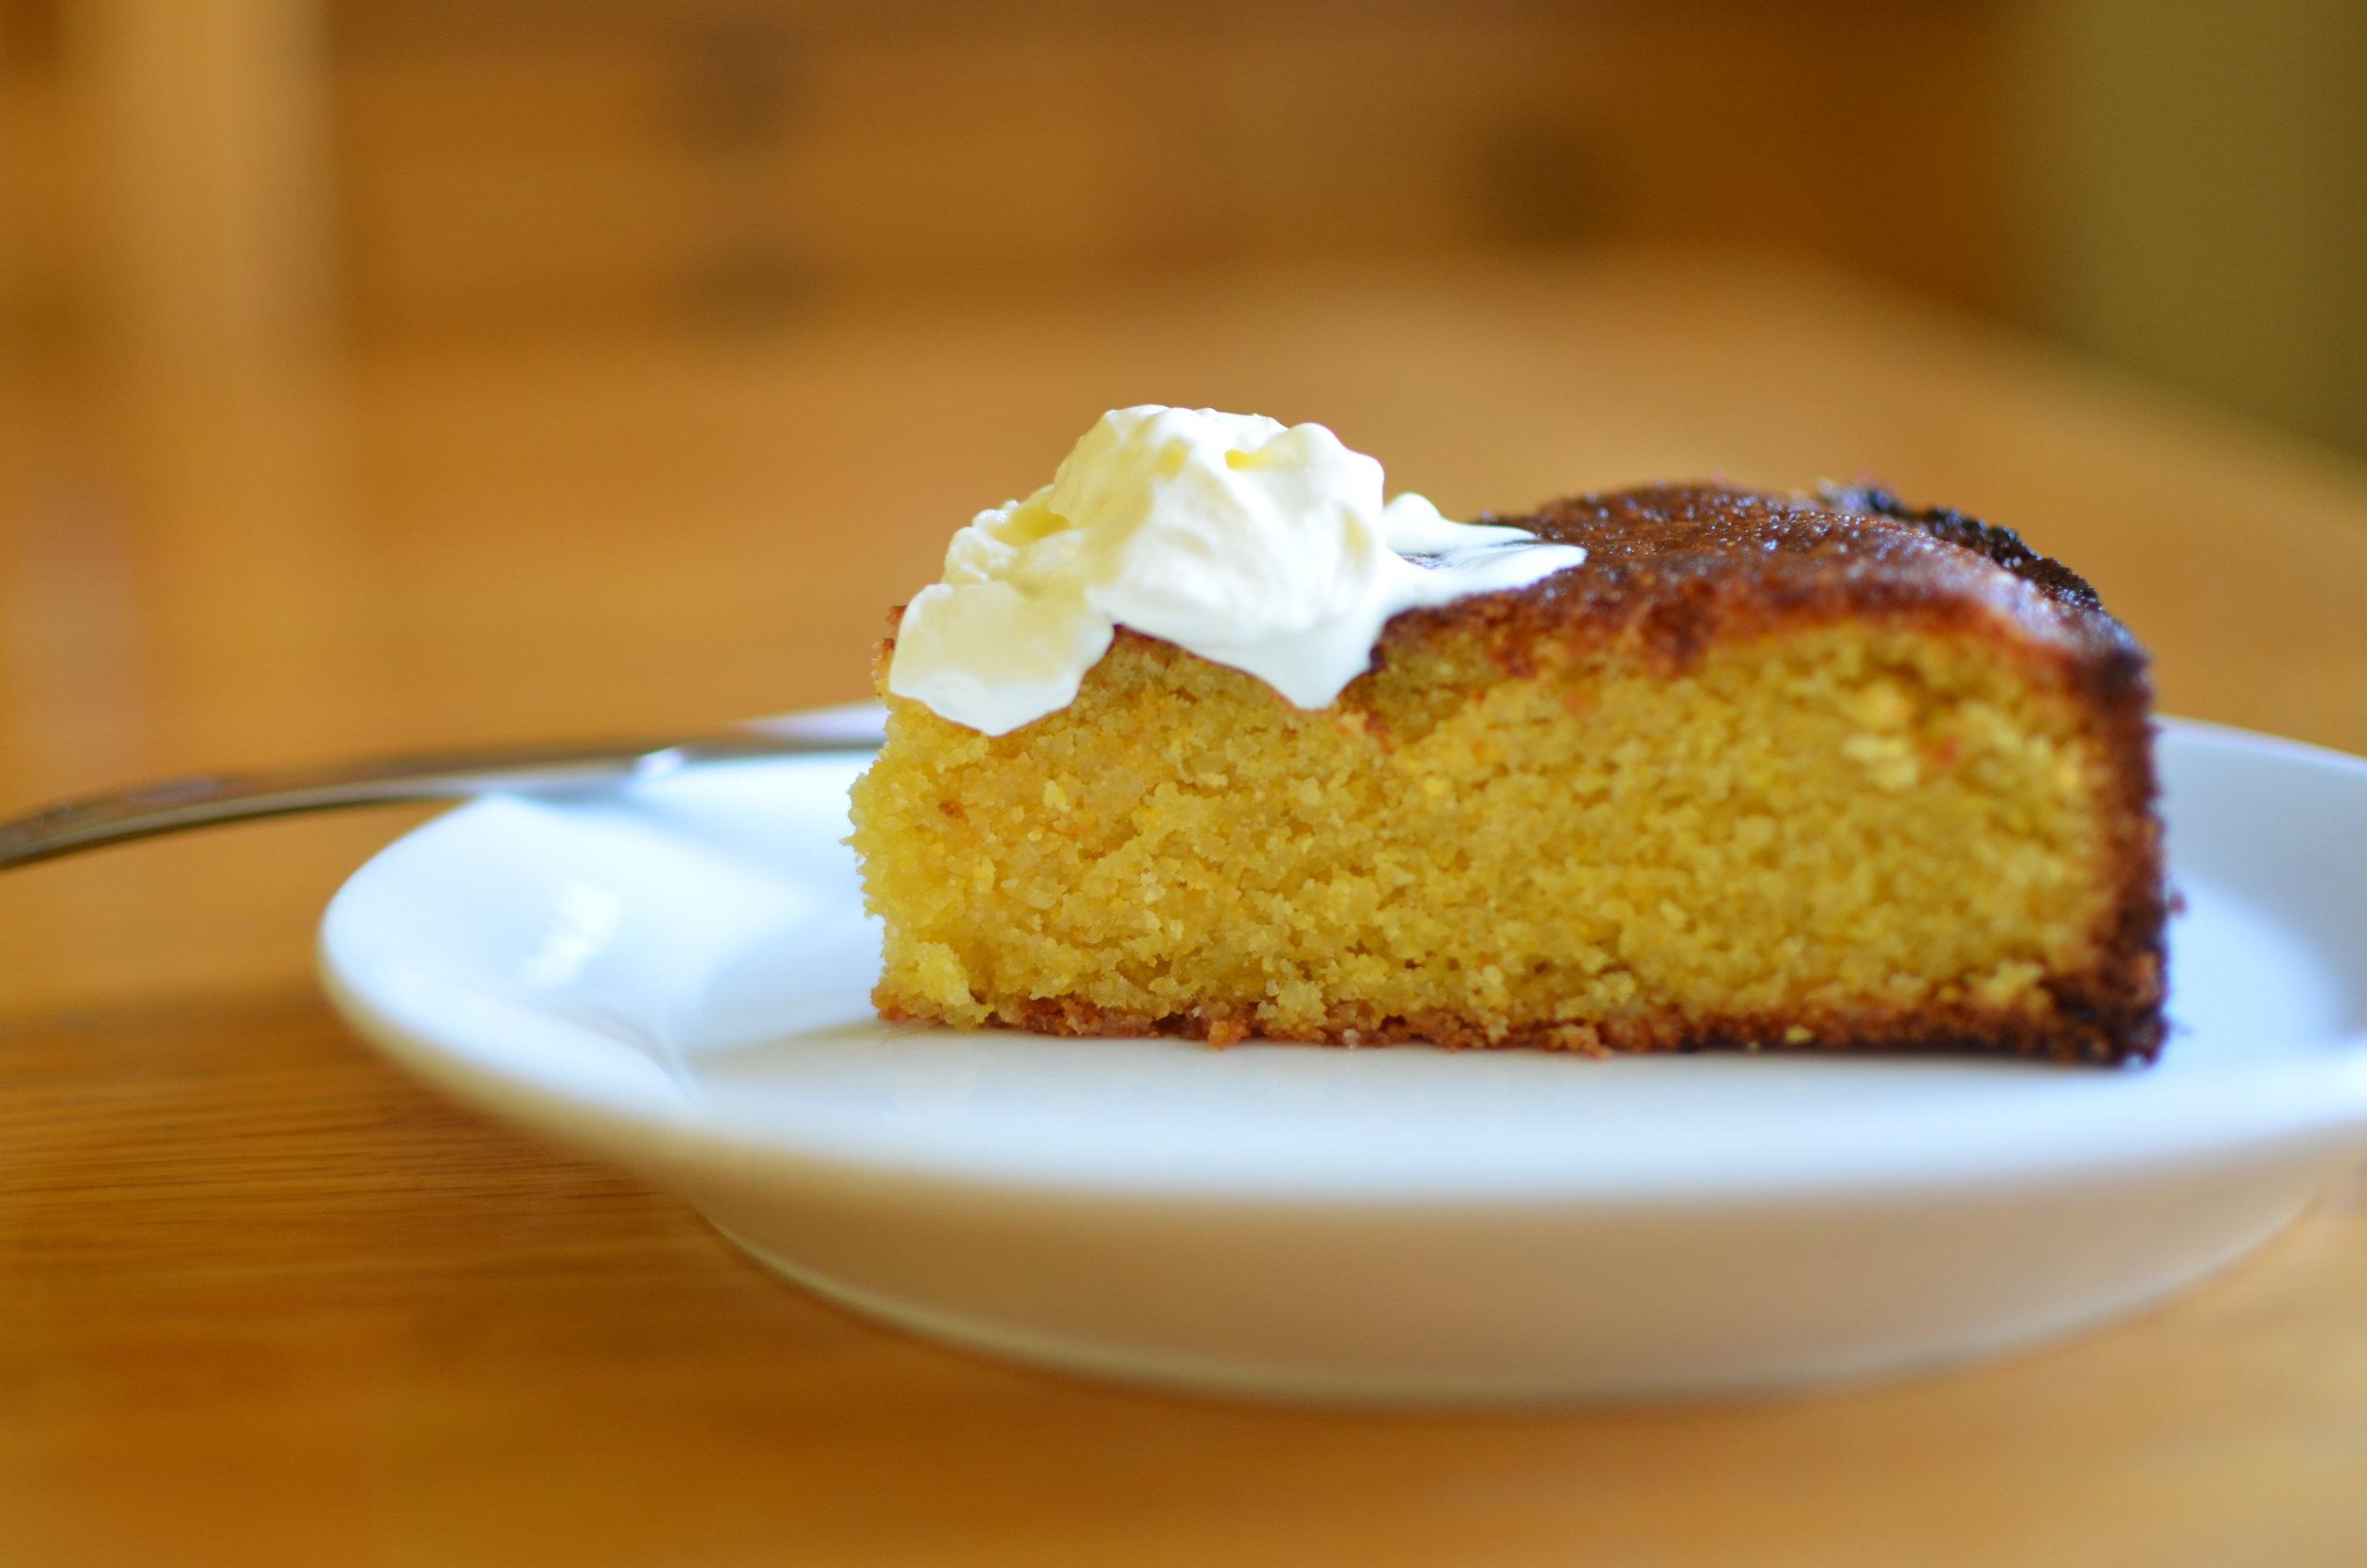 Jamie' Oliver's Orange Polenta Cake - see below for link to the recipe